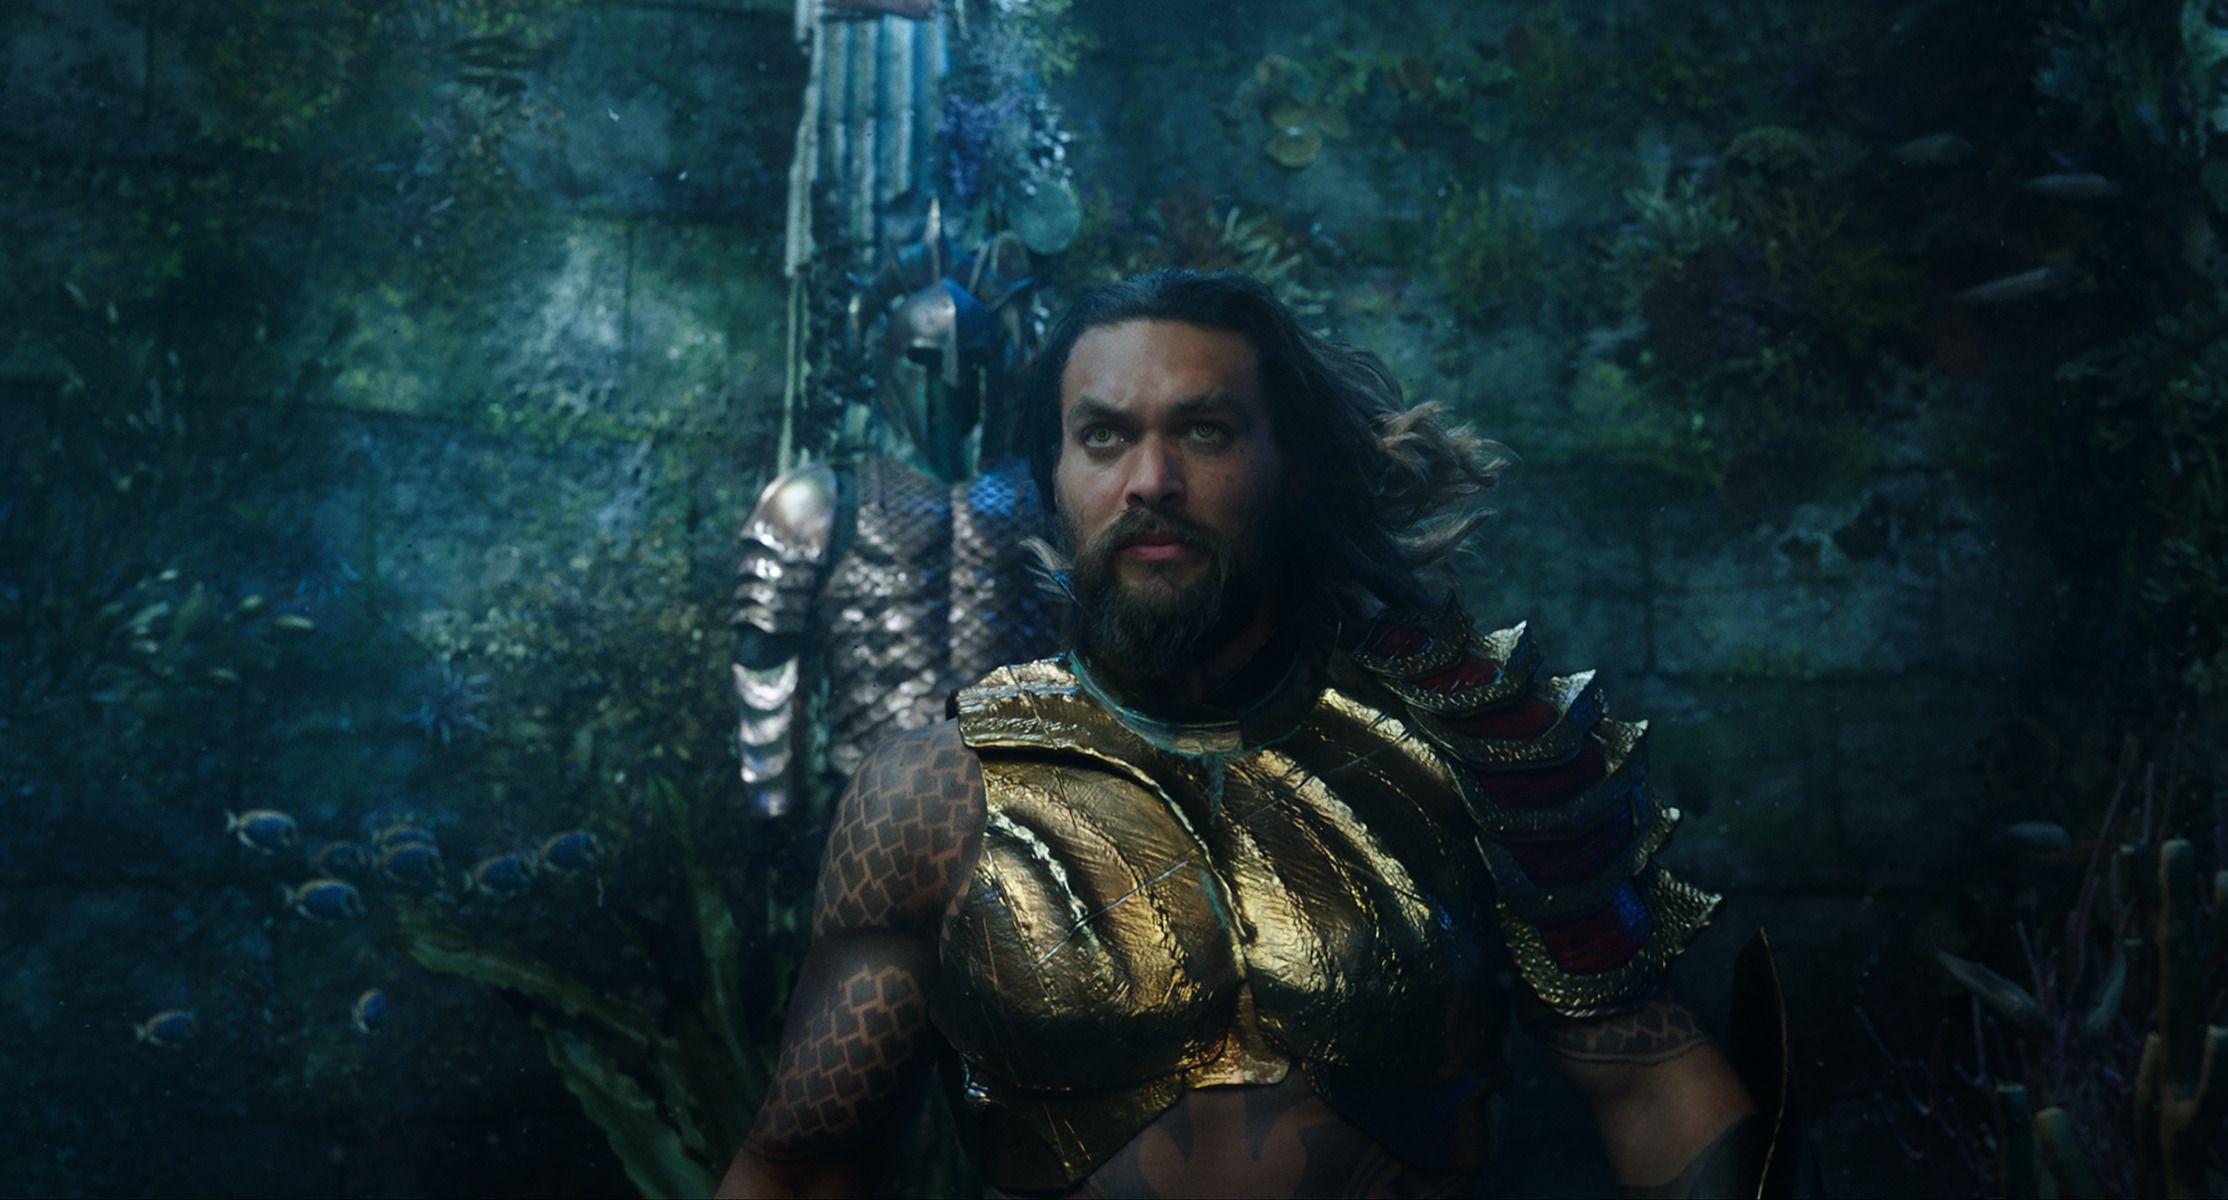 Movie Talk: 'Aquaman' Reviews Tease Epic Adventure and Dazzling Visuals